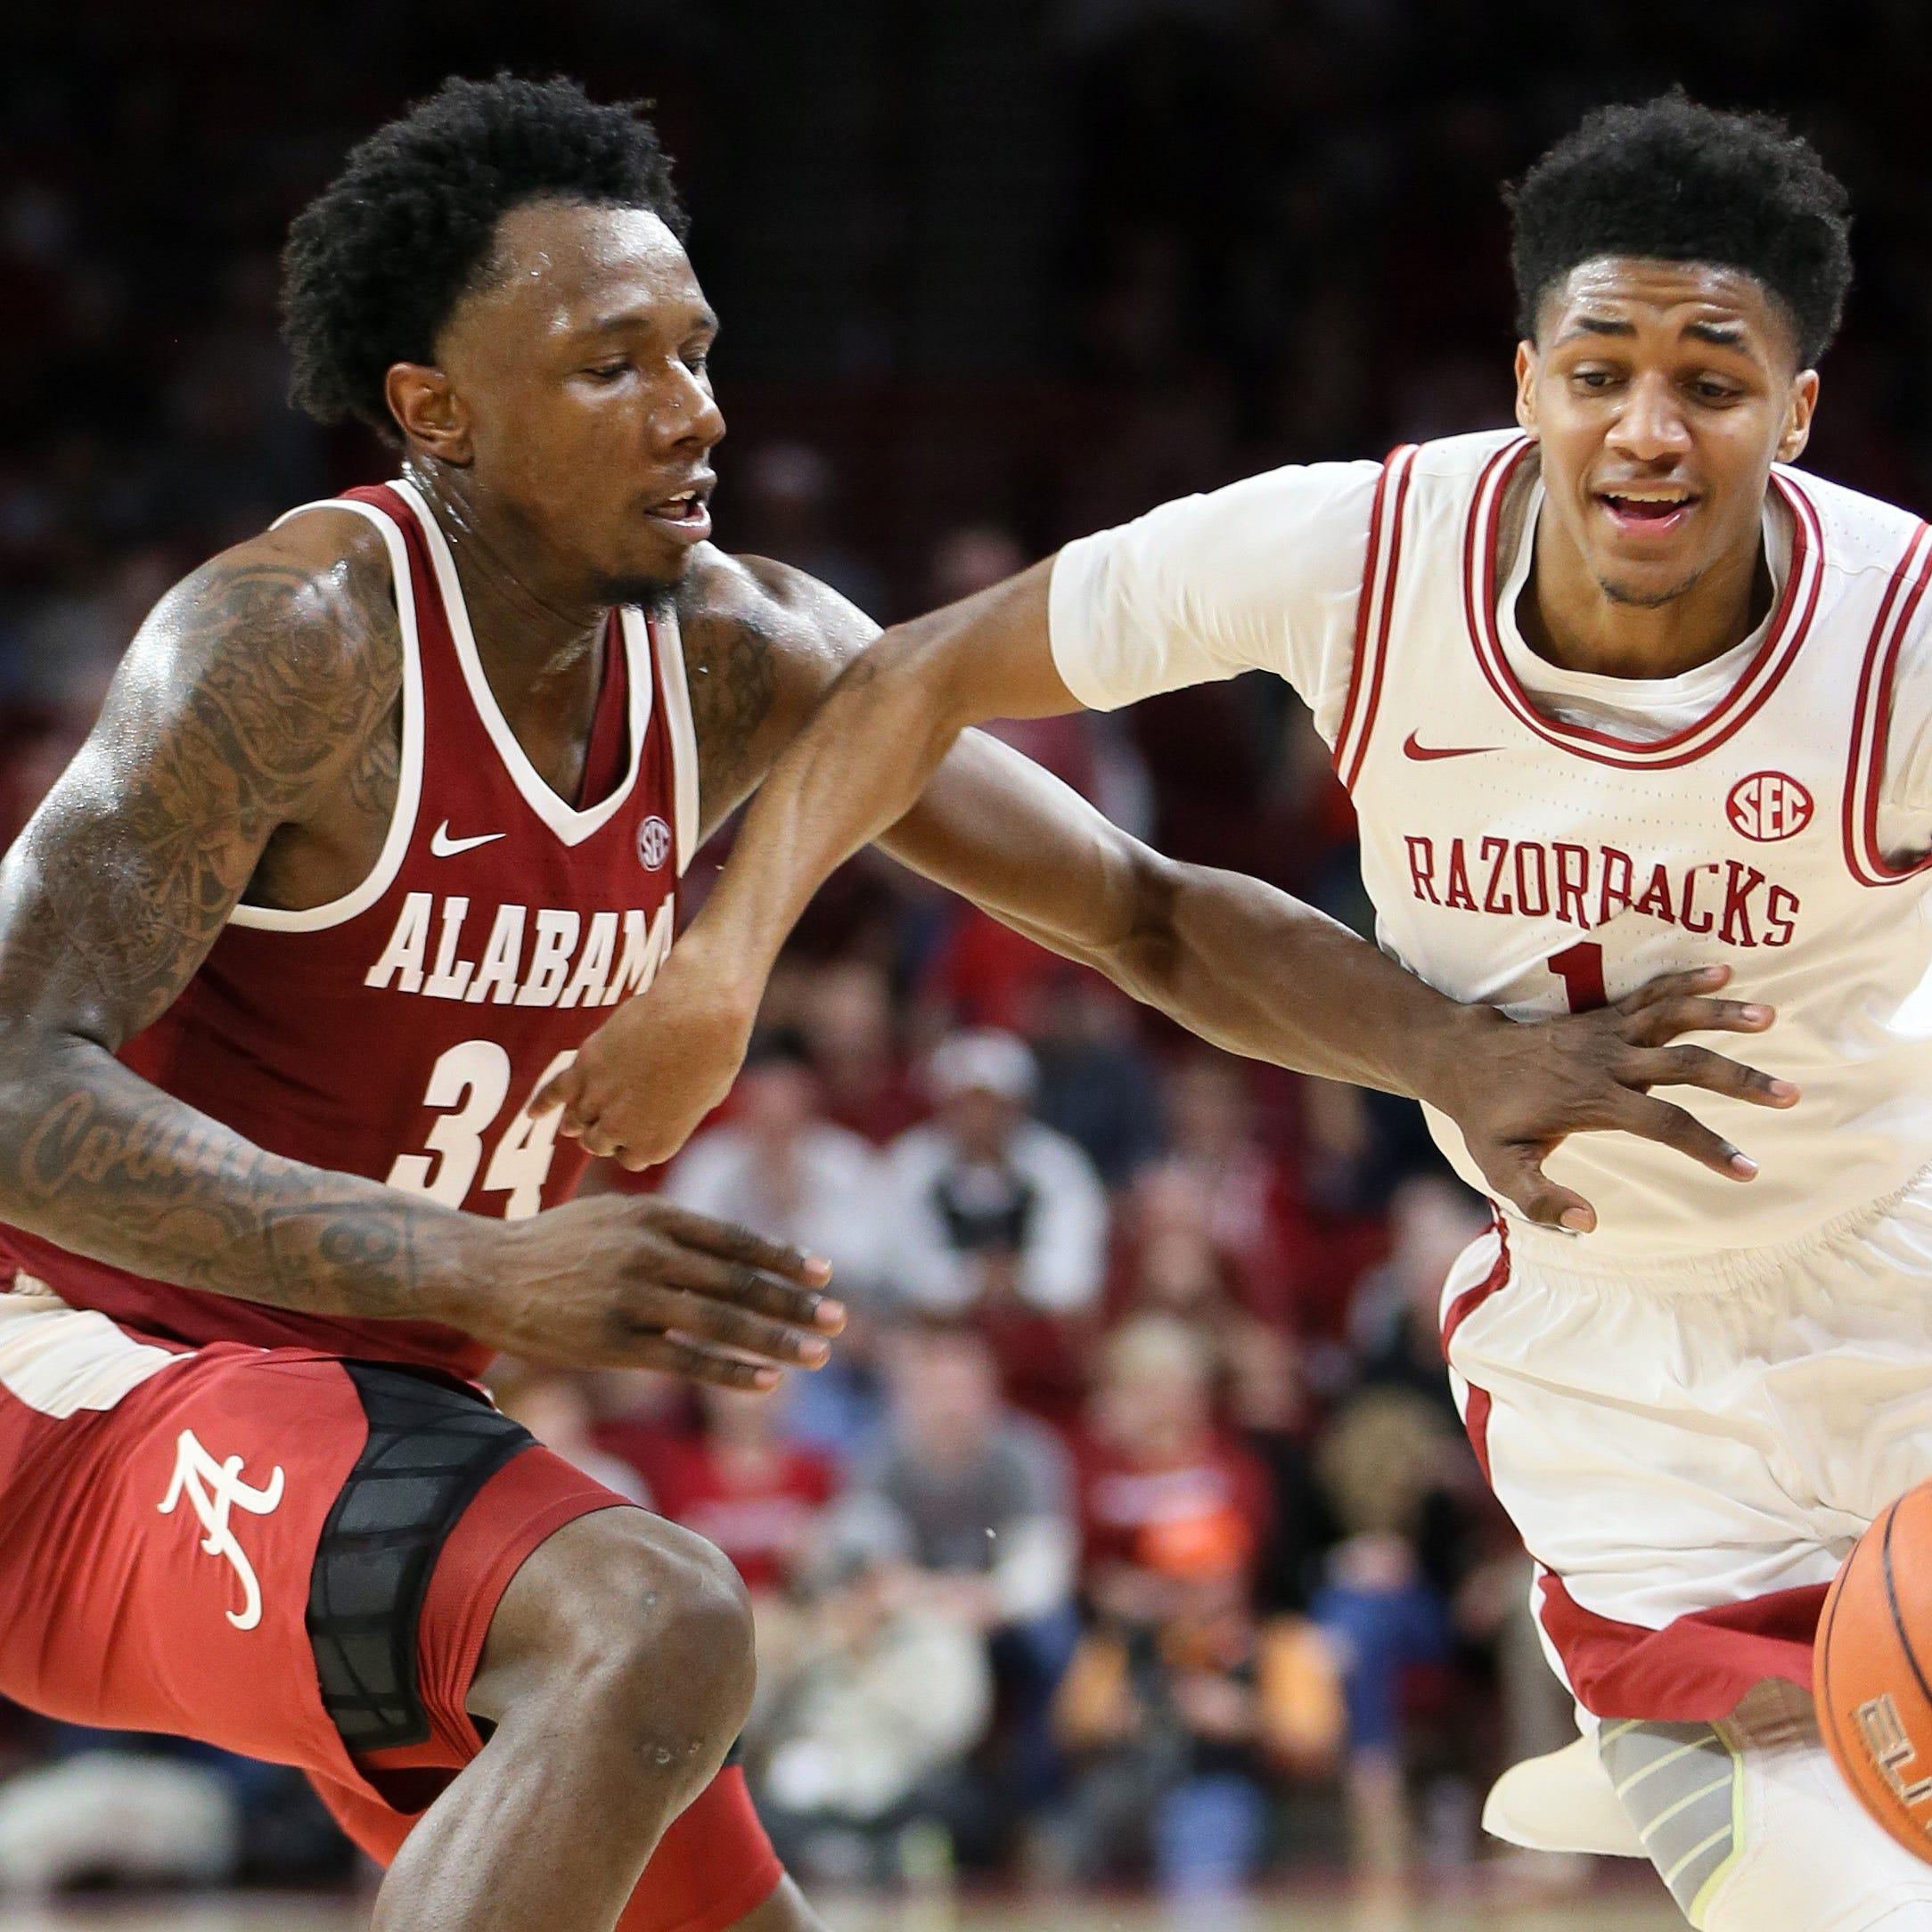 Joe Lunardi predicts Alabama basketball needs multiple SEC tournament wins for NCAA berth